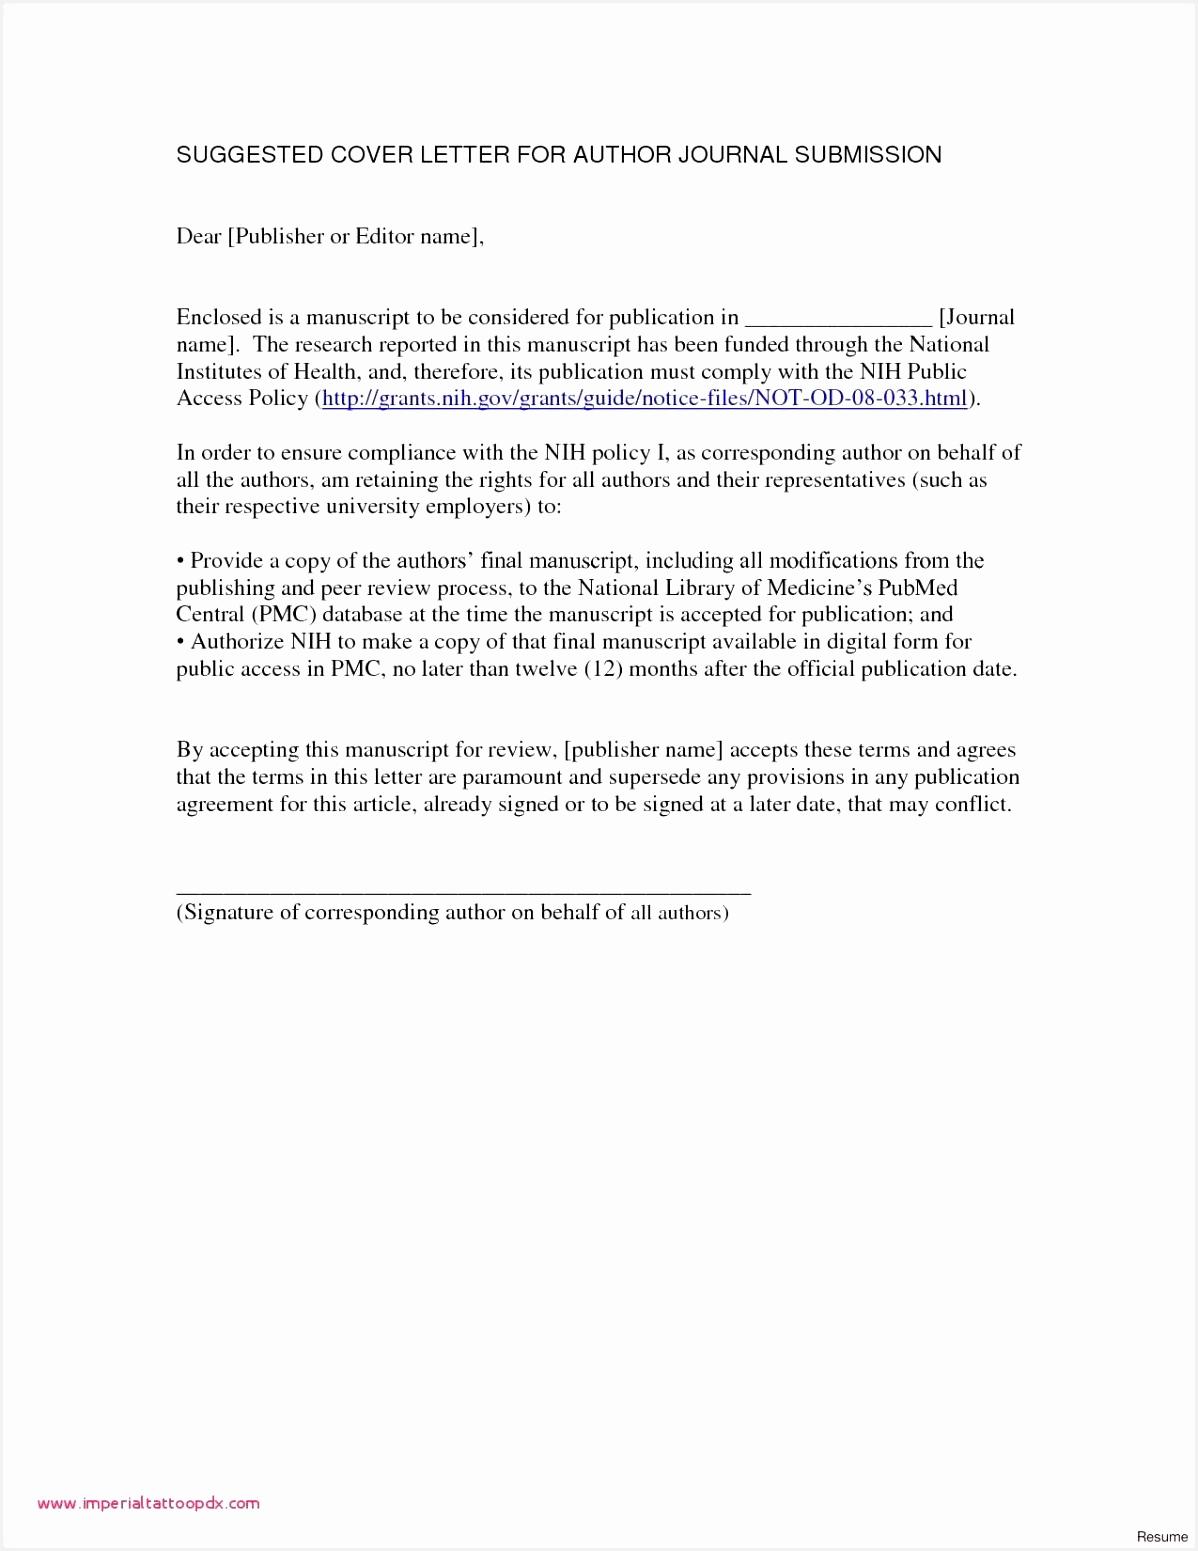 Federal Government Resume Sample Znggu Fresh Public Health Resume Sample Federal Government Resume Template Of 7 Federal Government Resume Sample